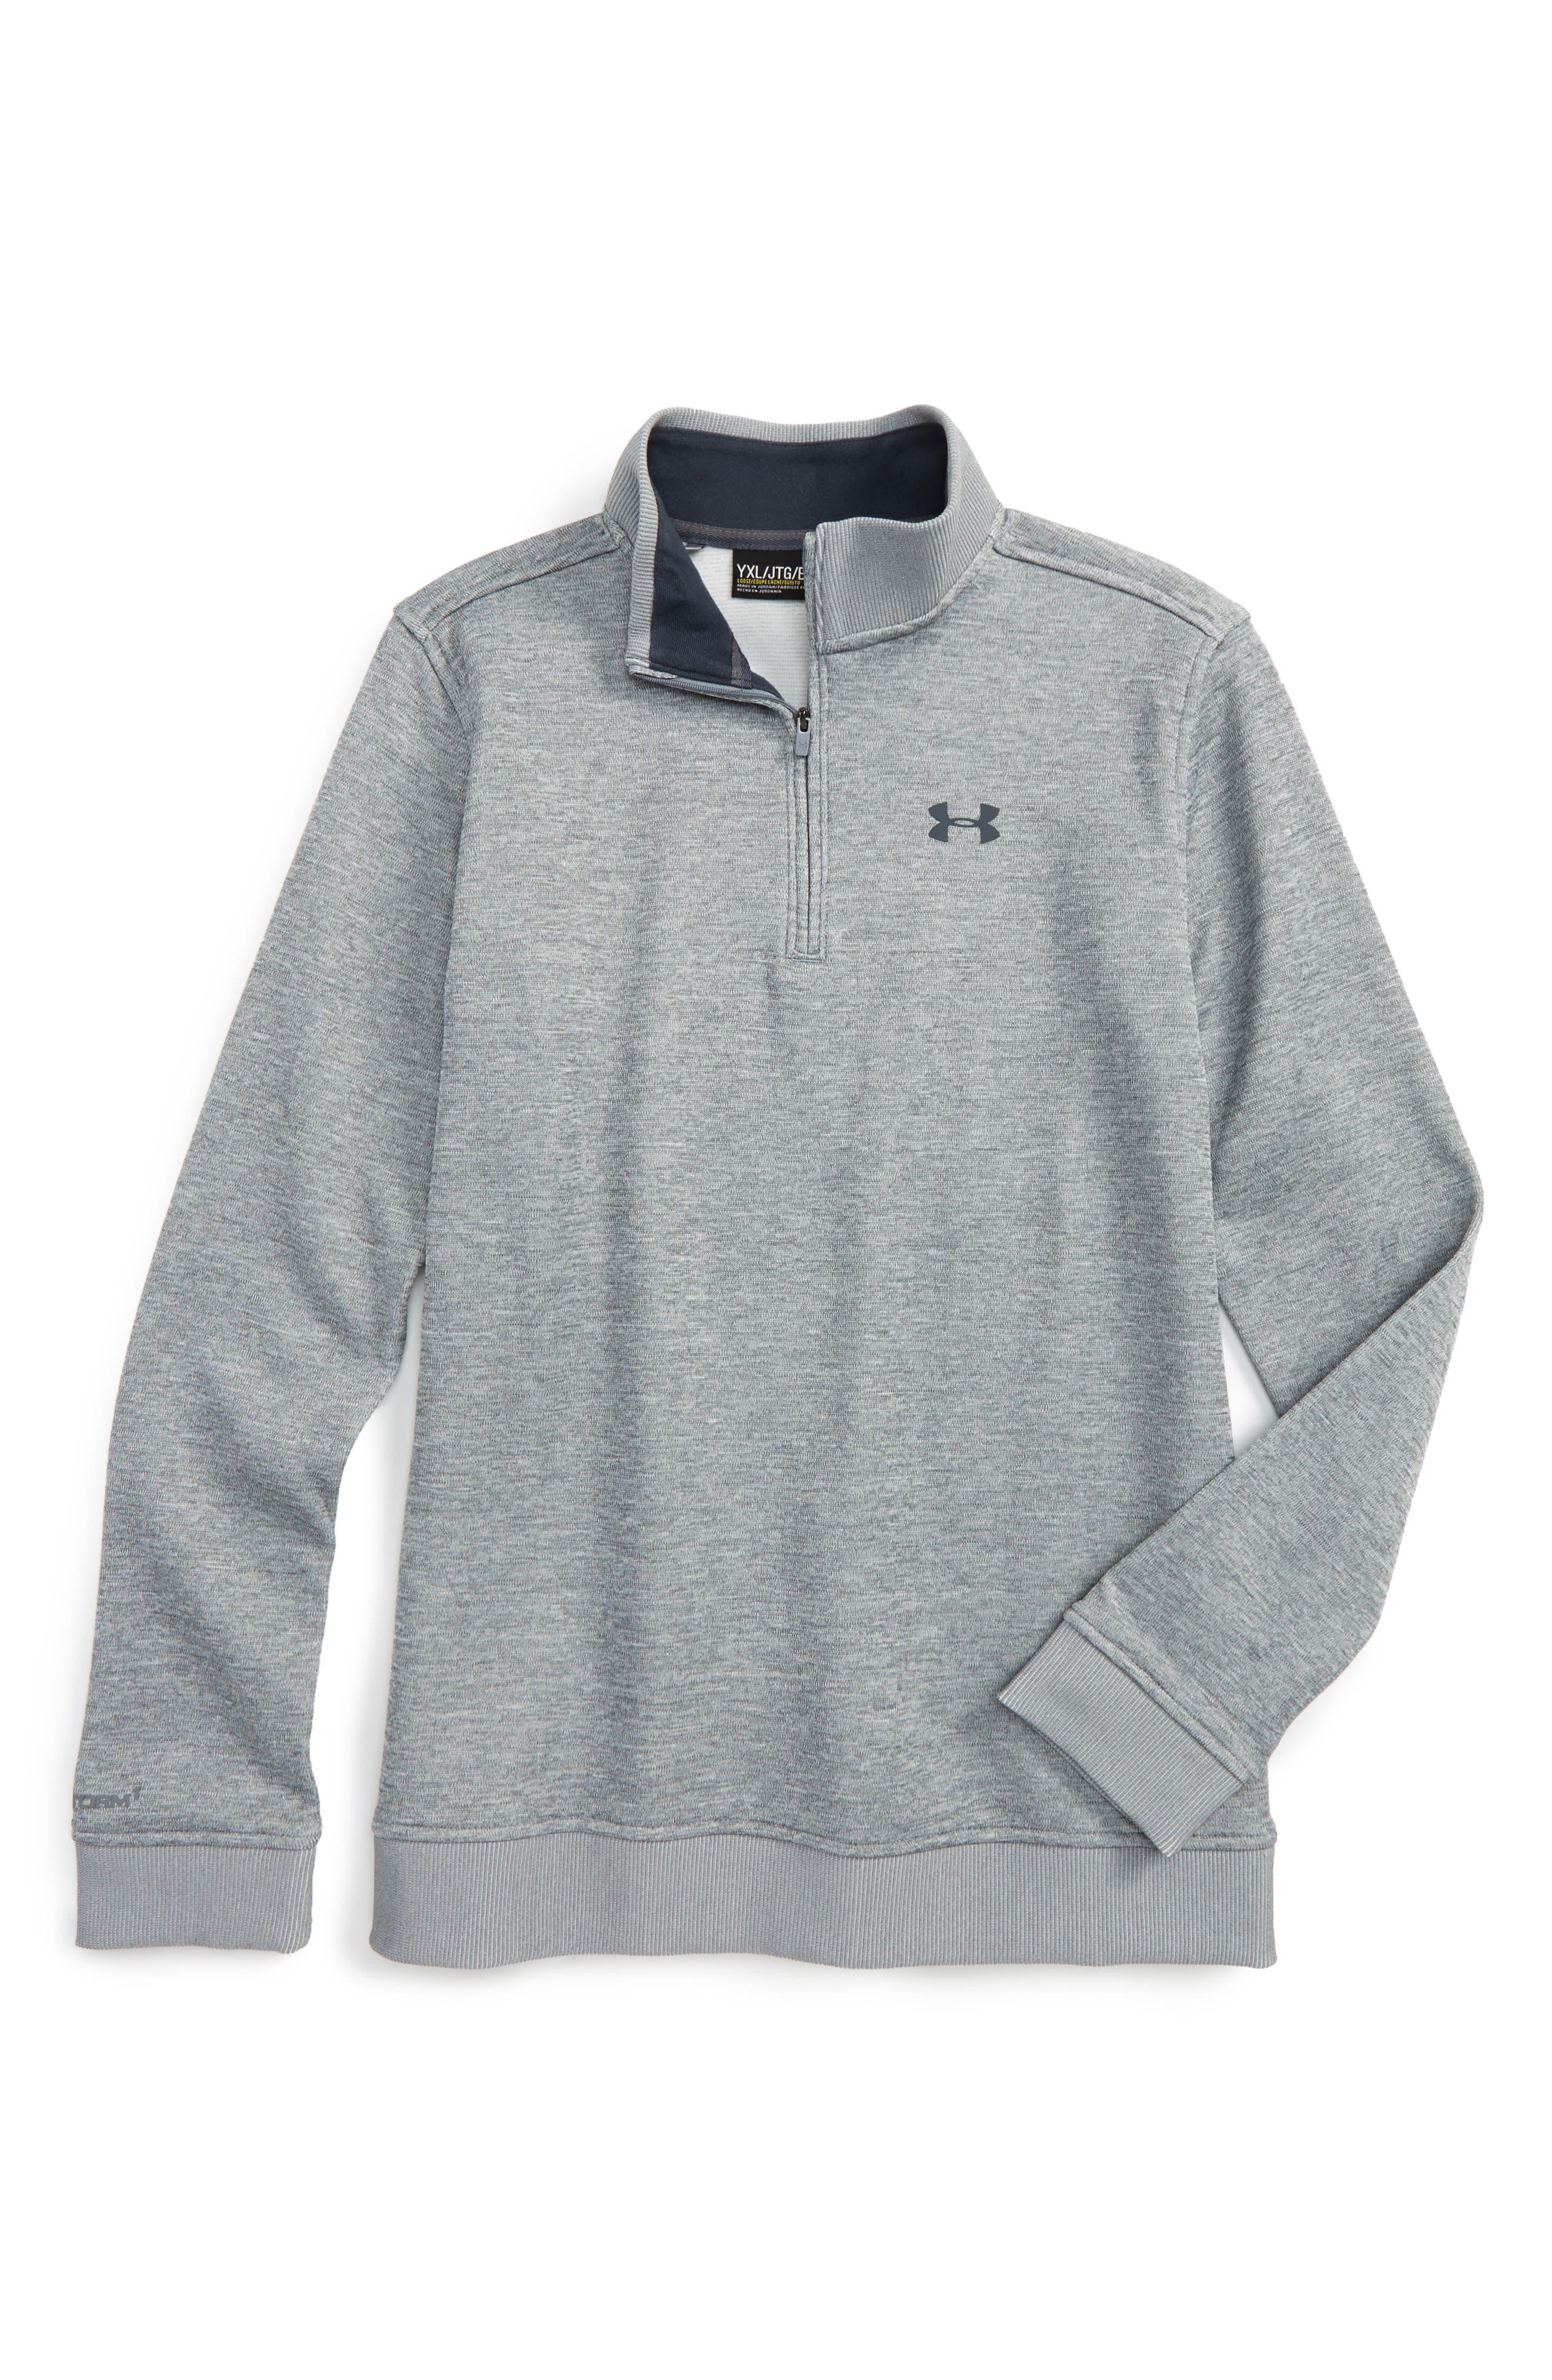 UNDER ARMOUR Storm Quarter Zip Sweater